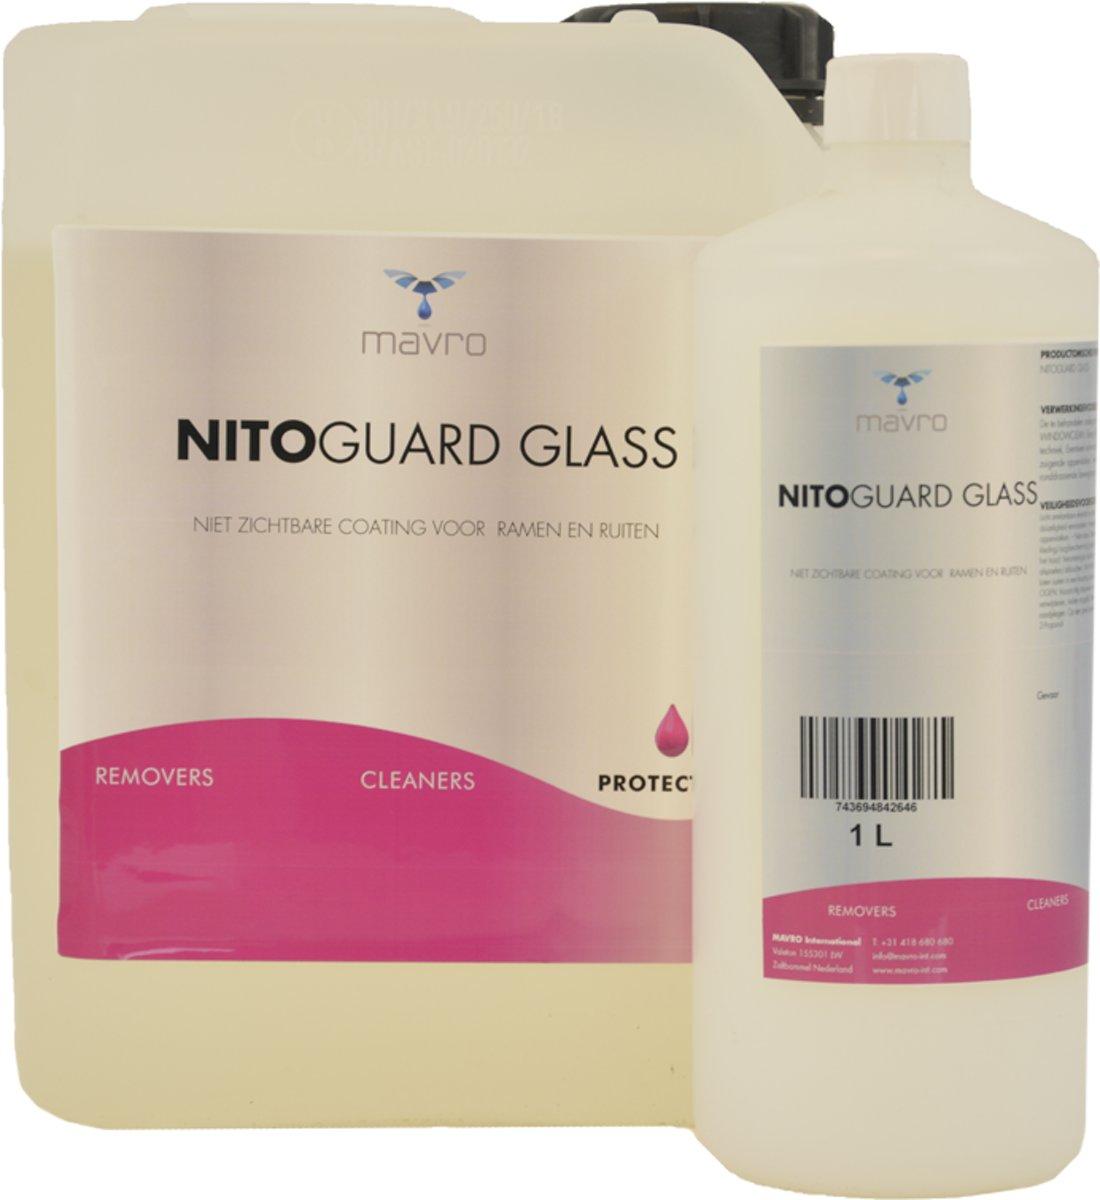 NITOGUARD GLASS 5L kopen